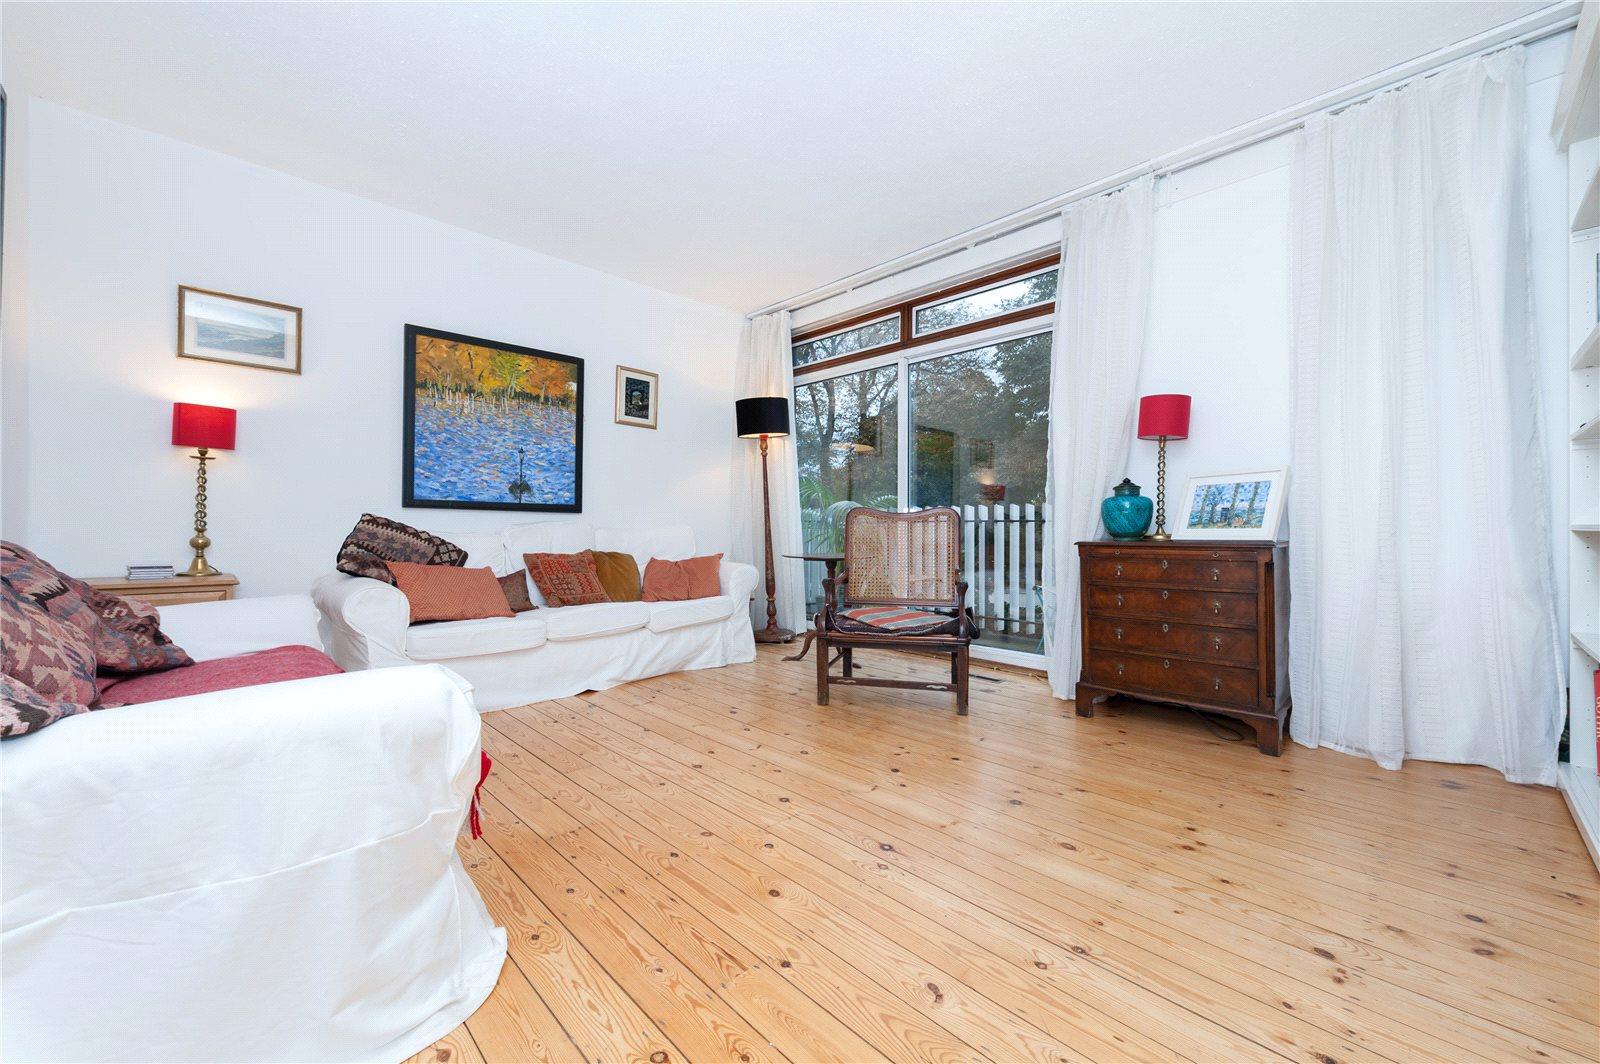 3 Bedrooms Maisonette Flat for sale in Gore Road, South Hackney, E9